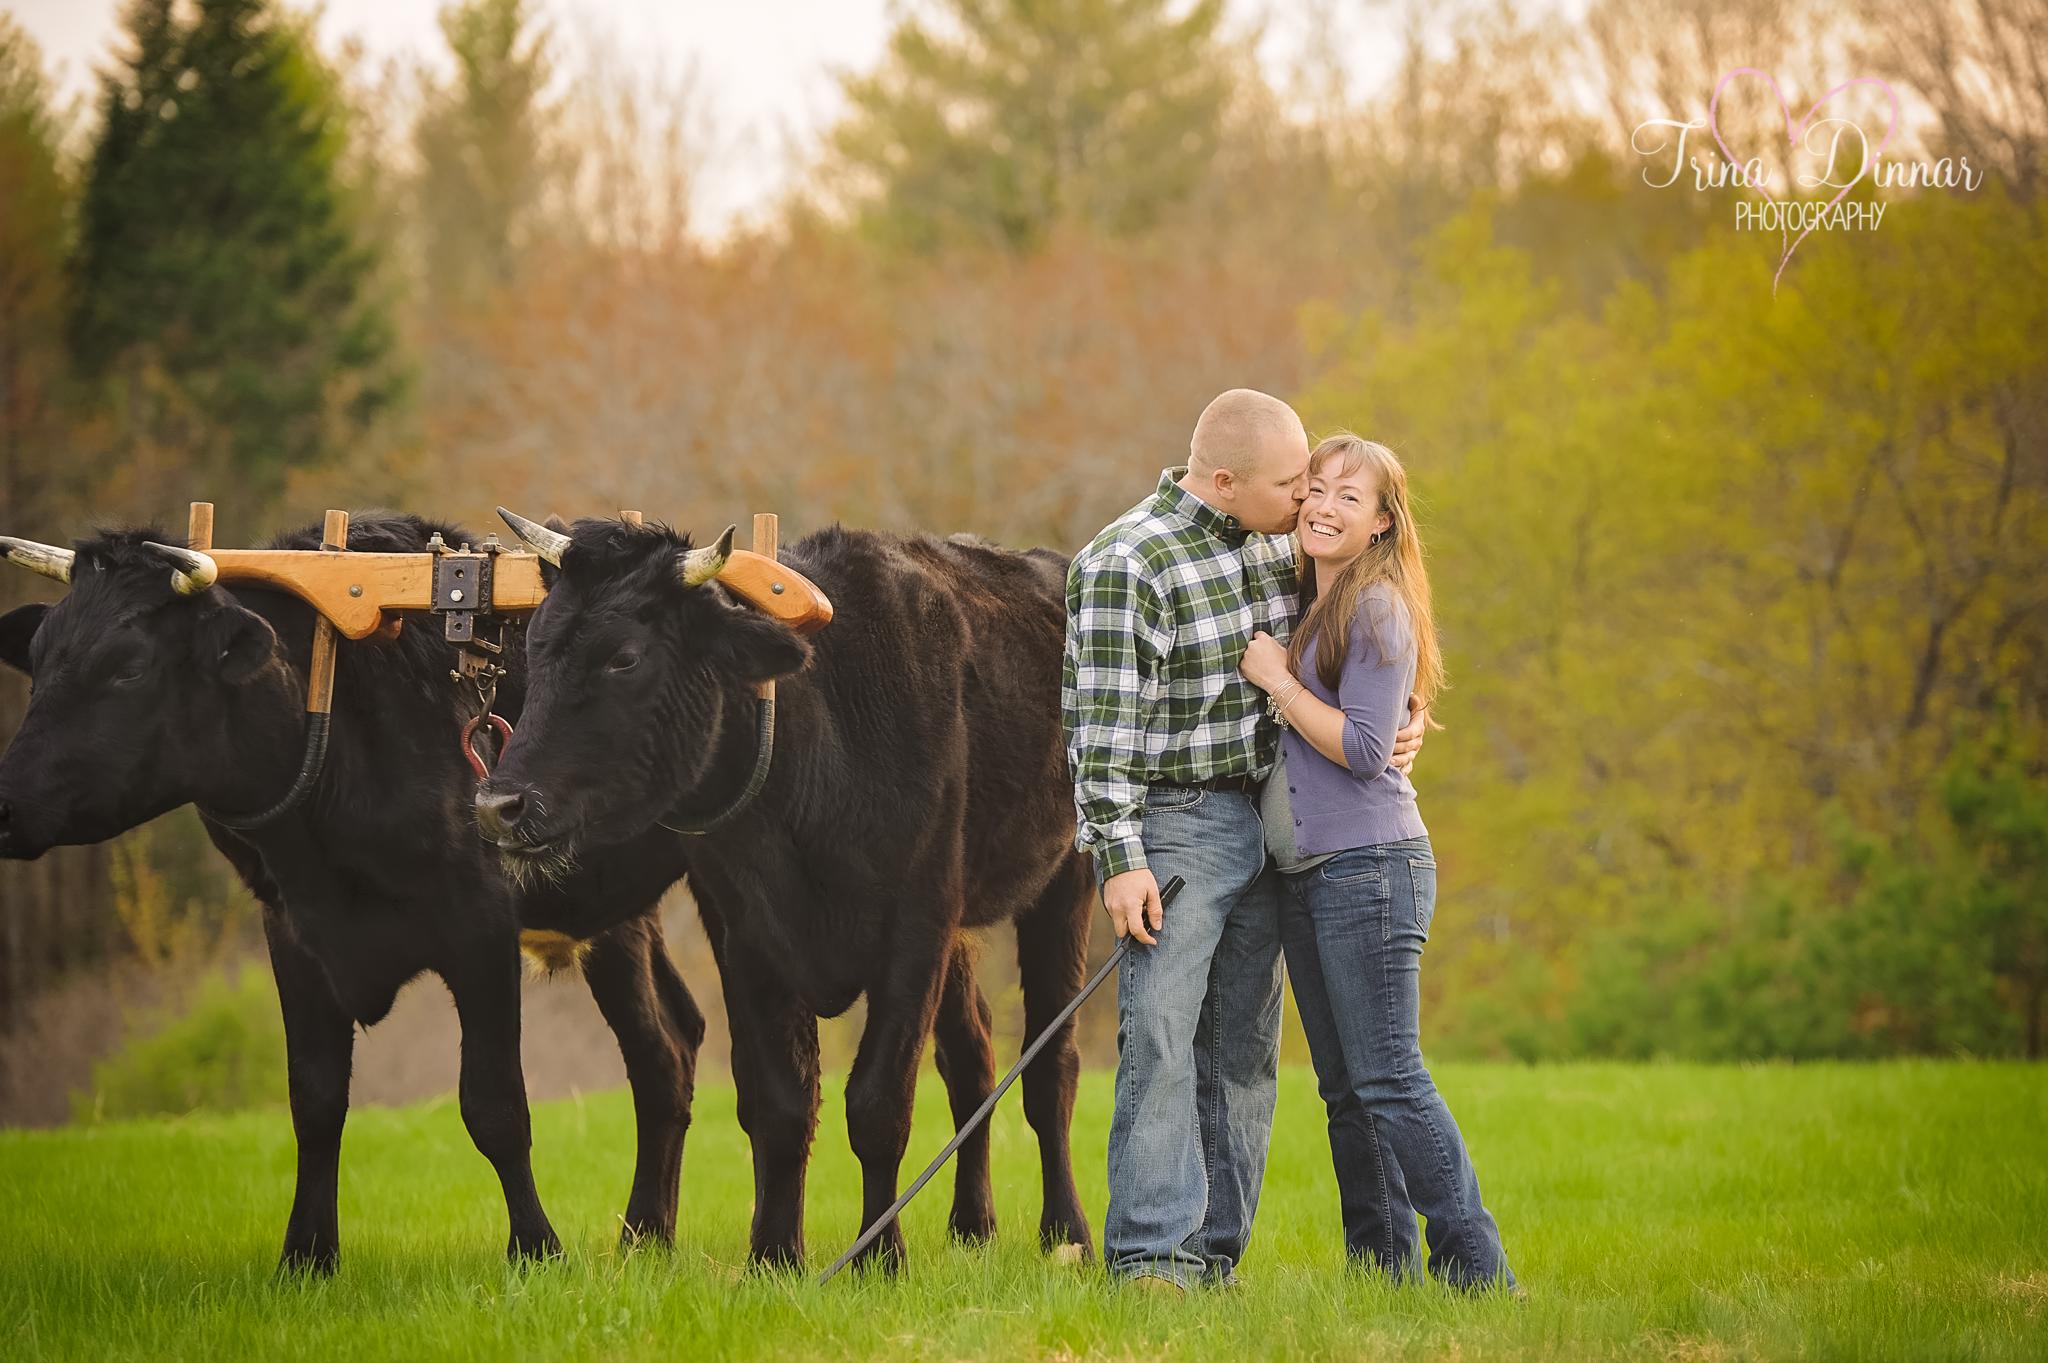 Maine wedding photographers anticipate the couple's rustic farm wedding